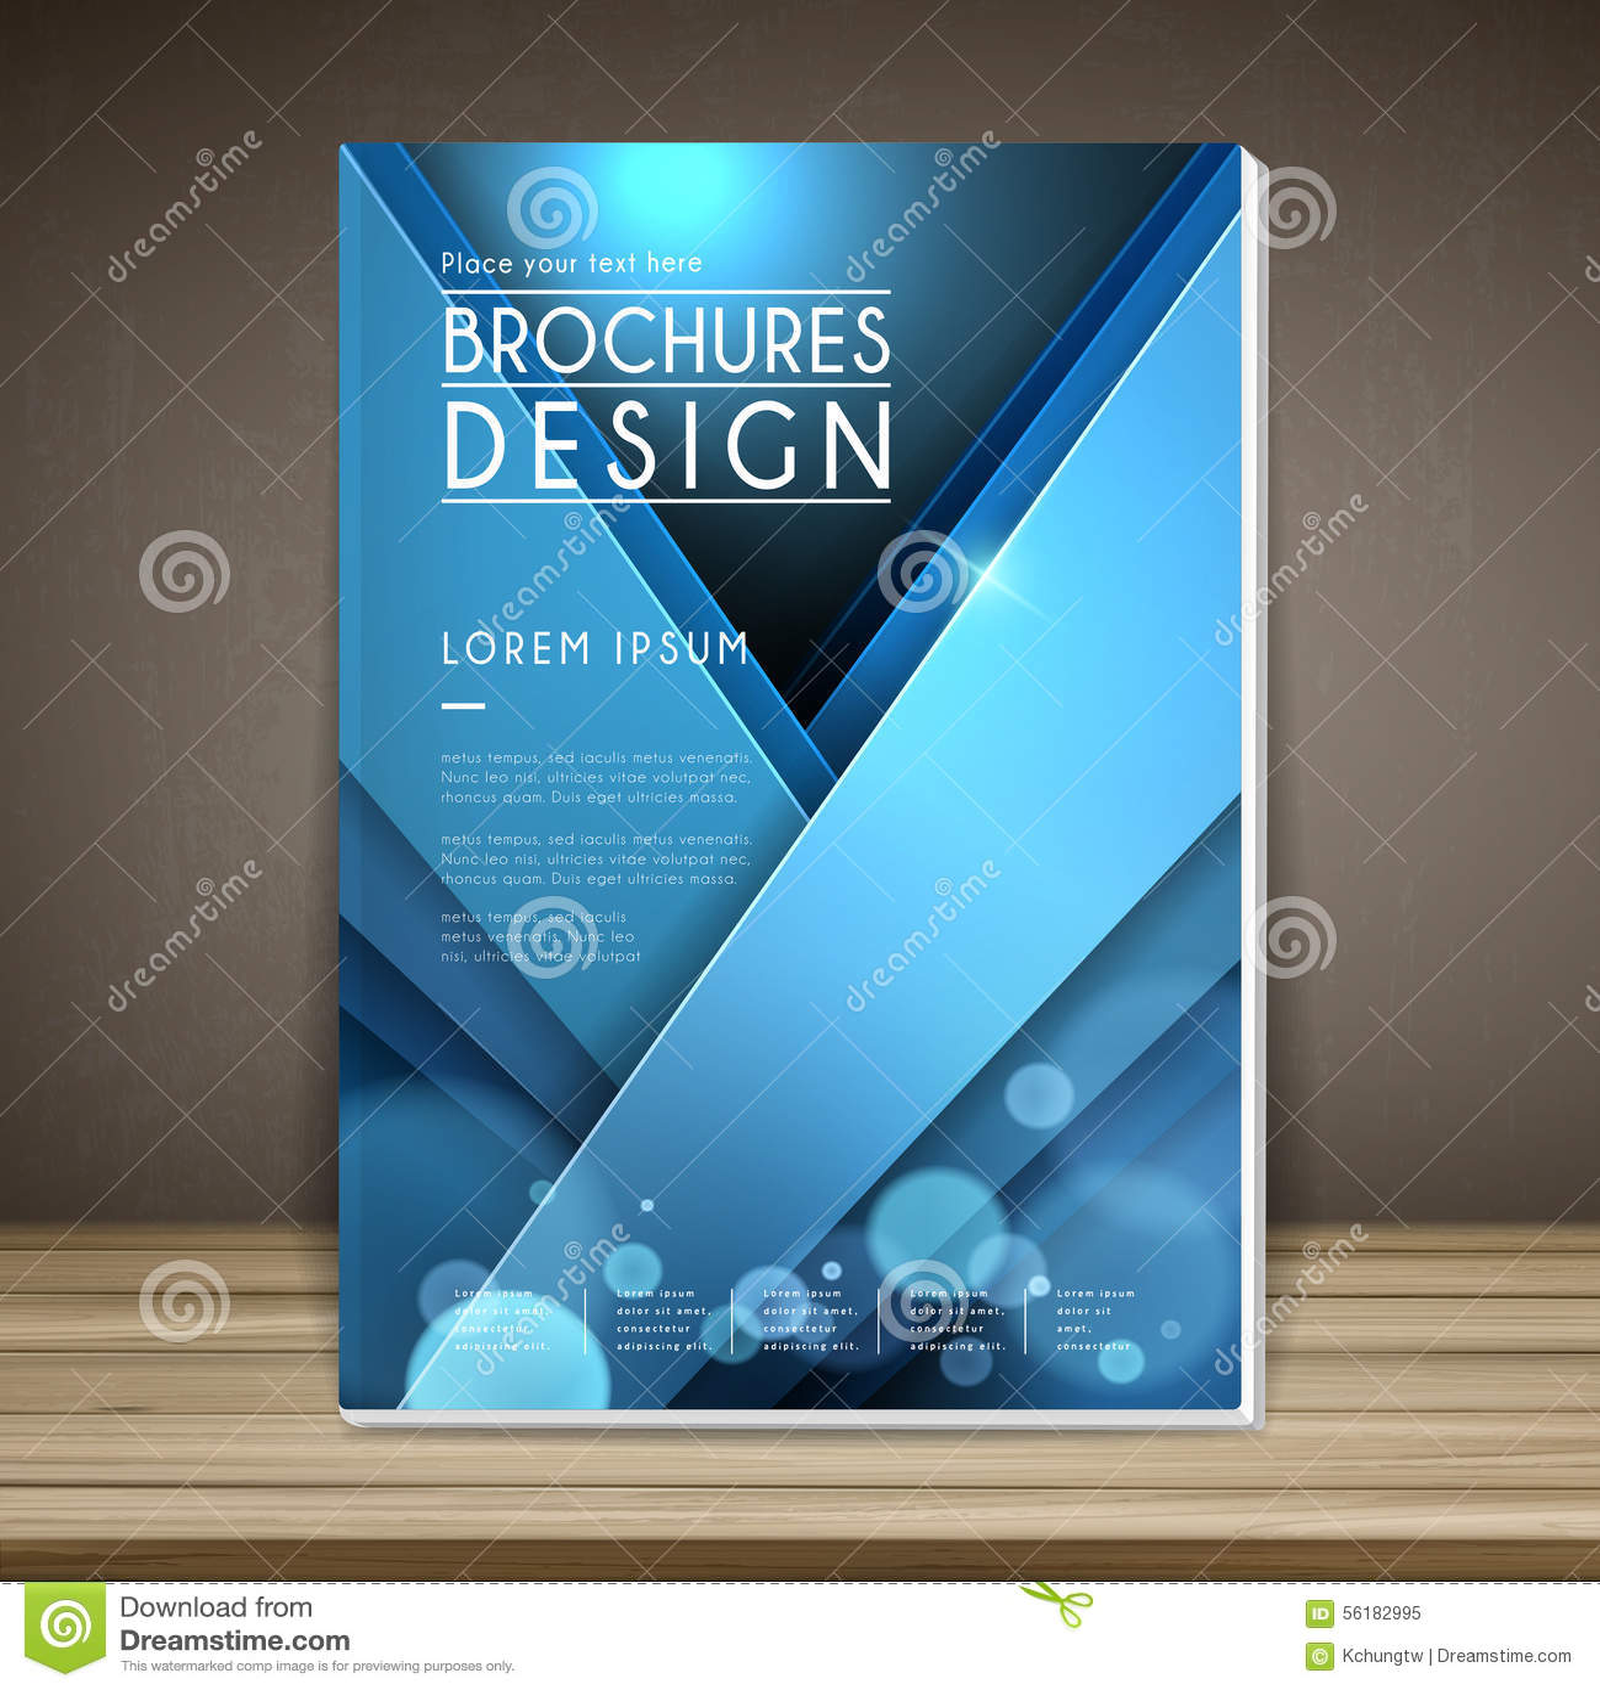 Book Cover Design Photo Elements : Elegant book cover template design stock vector image